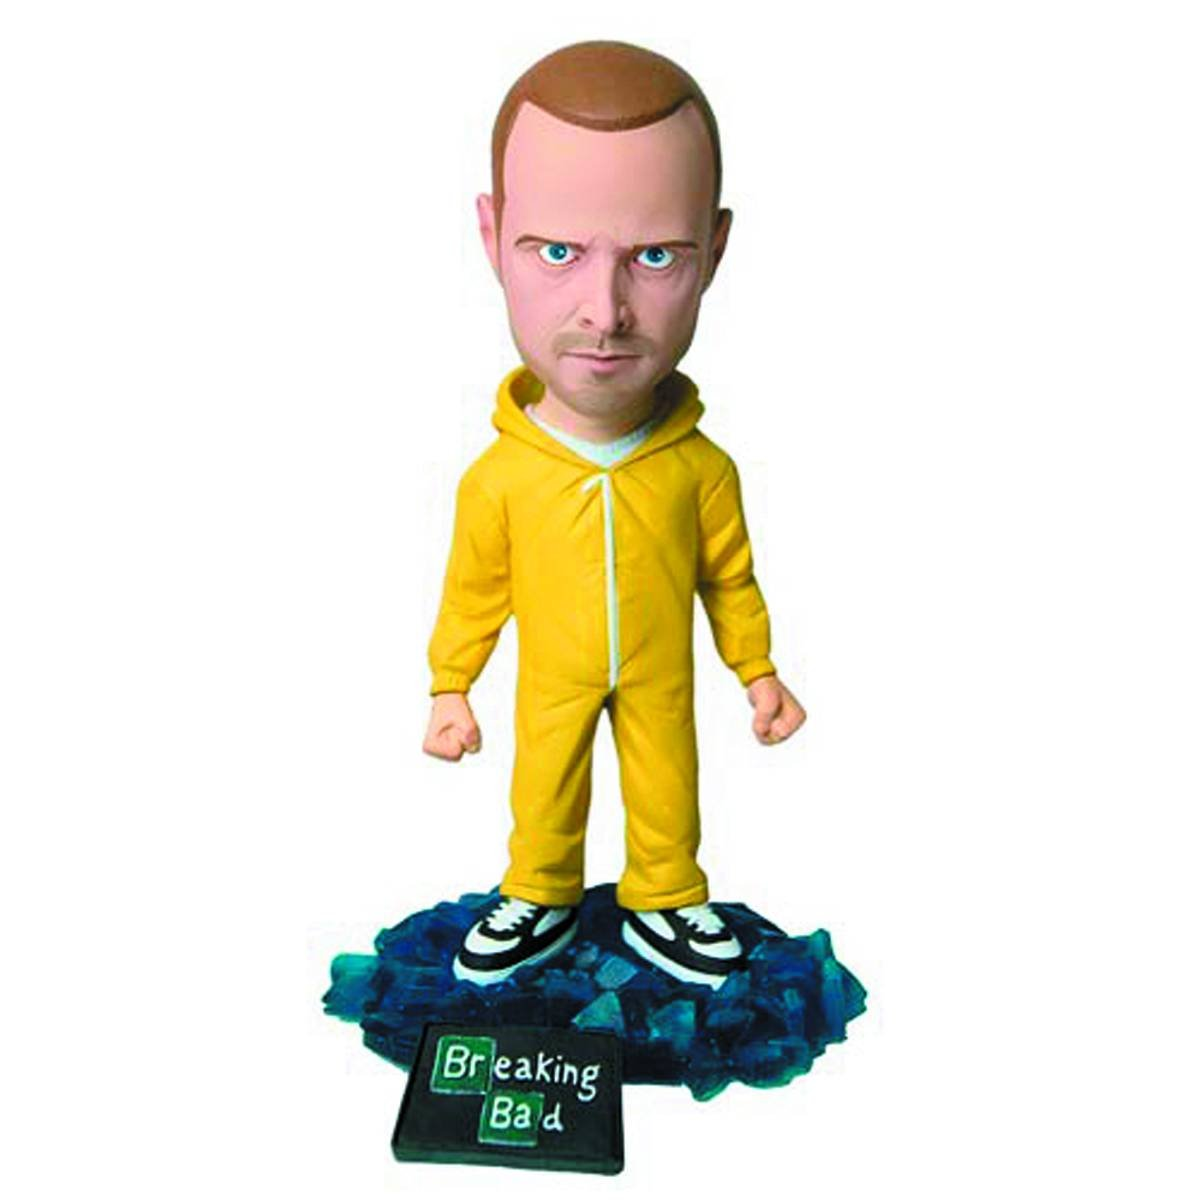 "Mezco Toyz Breaking Bad 6"" Jesse Pinkman Bobblehead Toy"